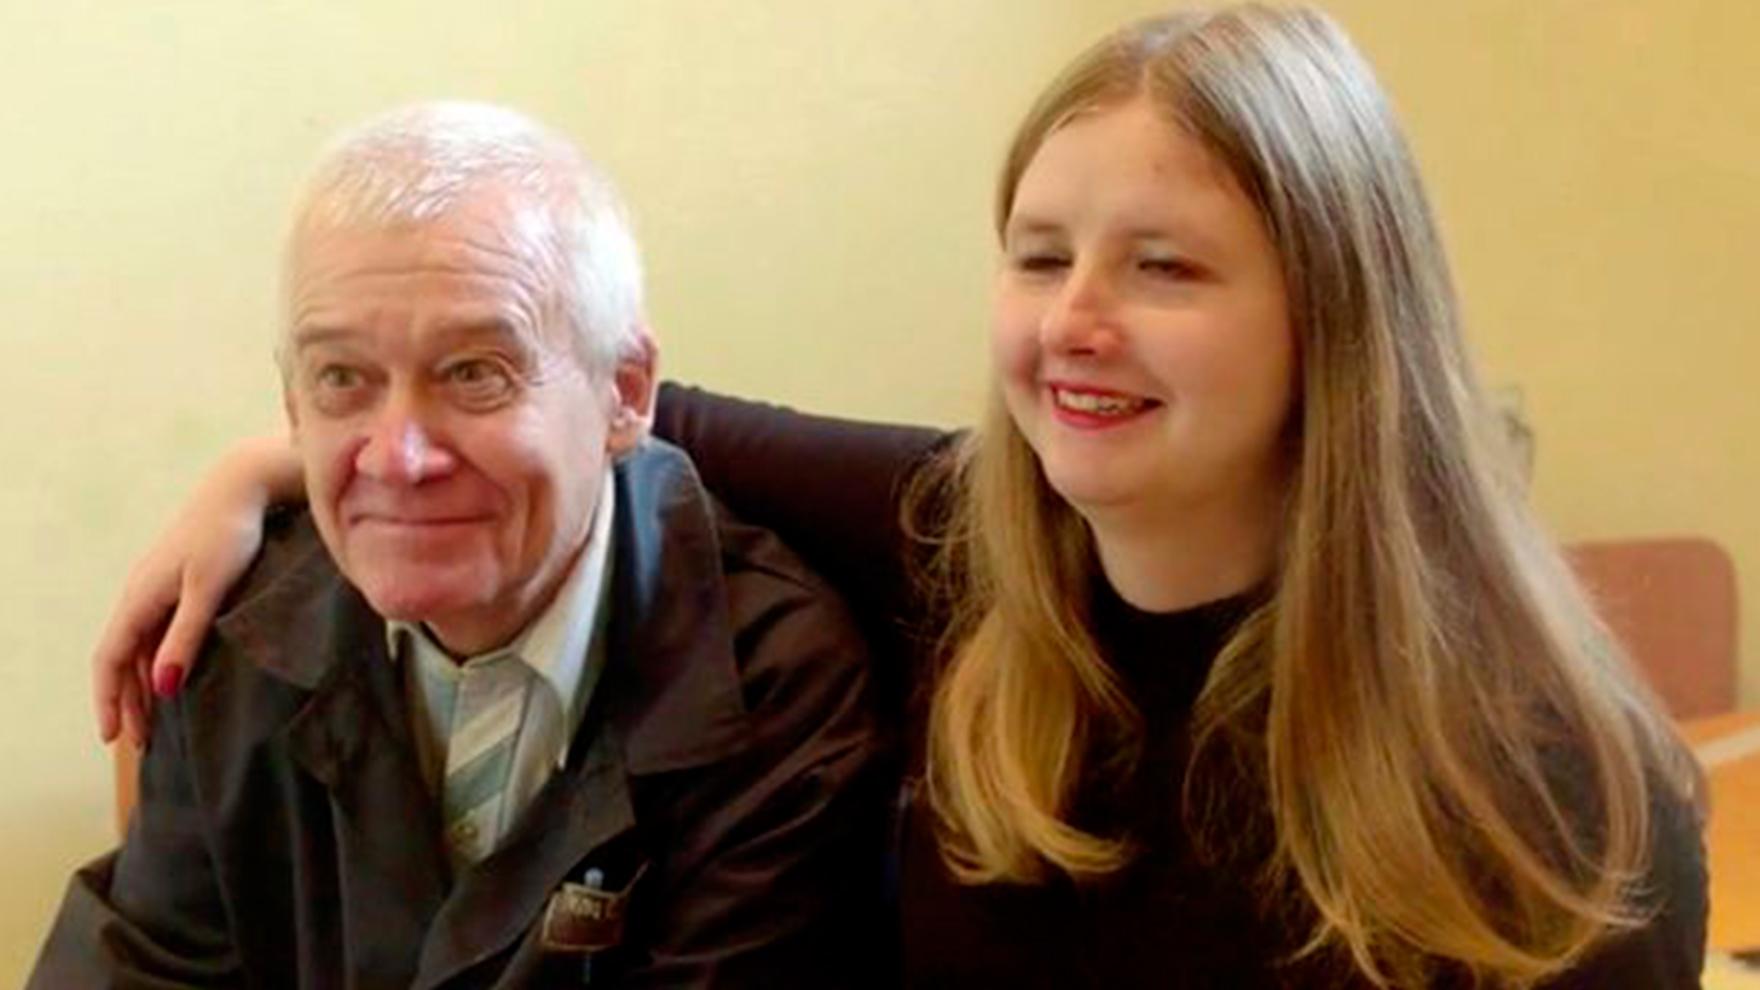 Sergey-Tkach-with-his-25-year-old-wife-Elena